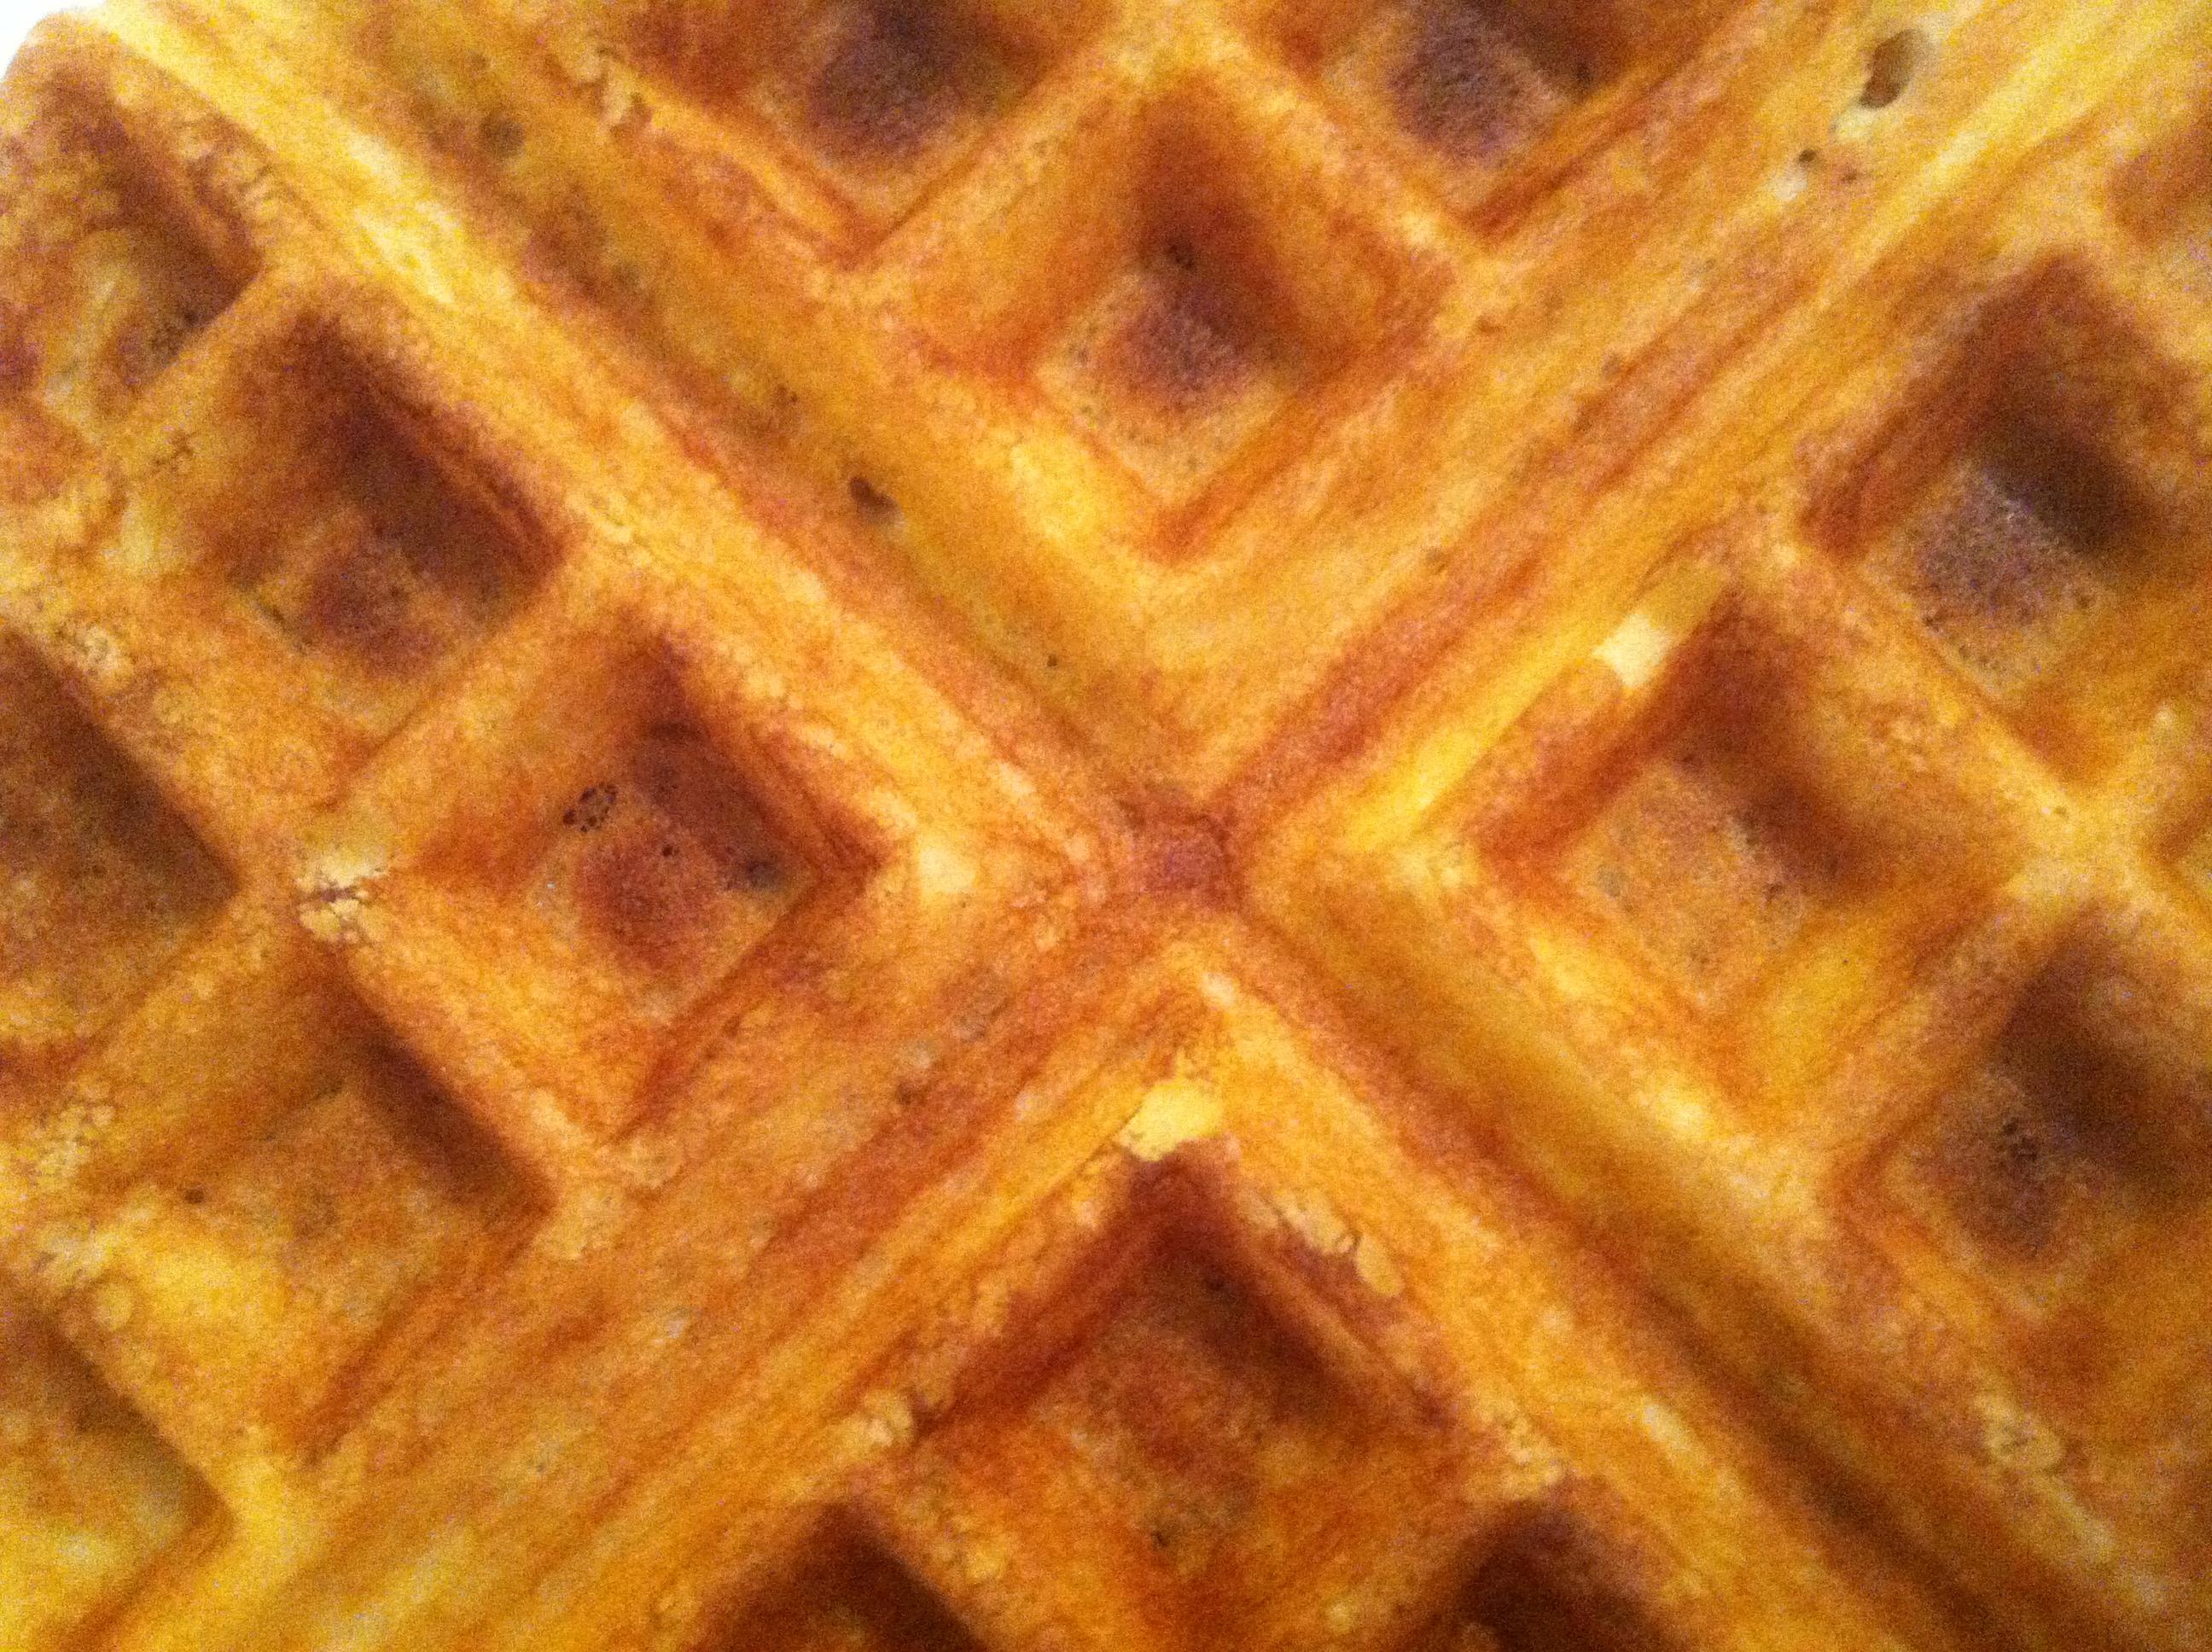 GF Brlgian Waffle